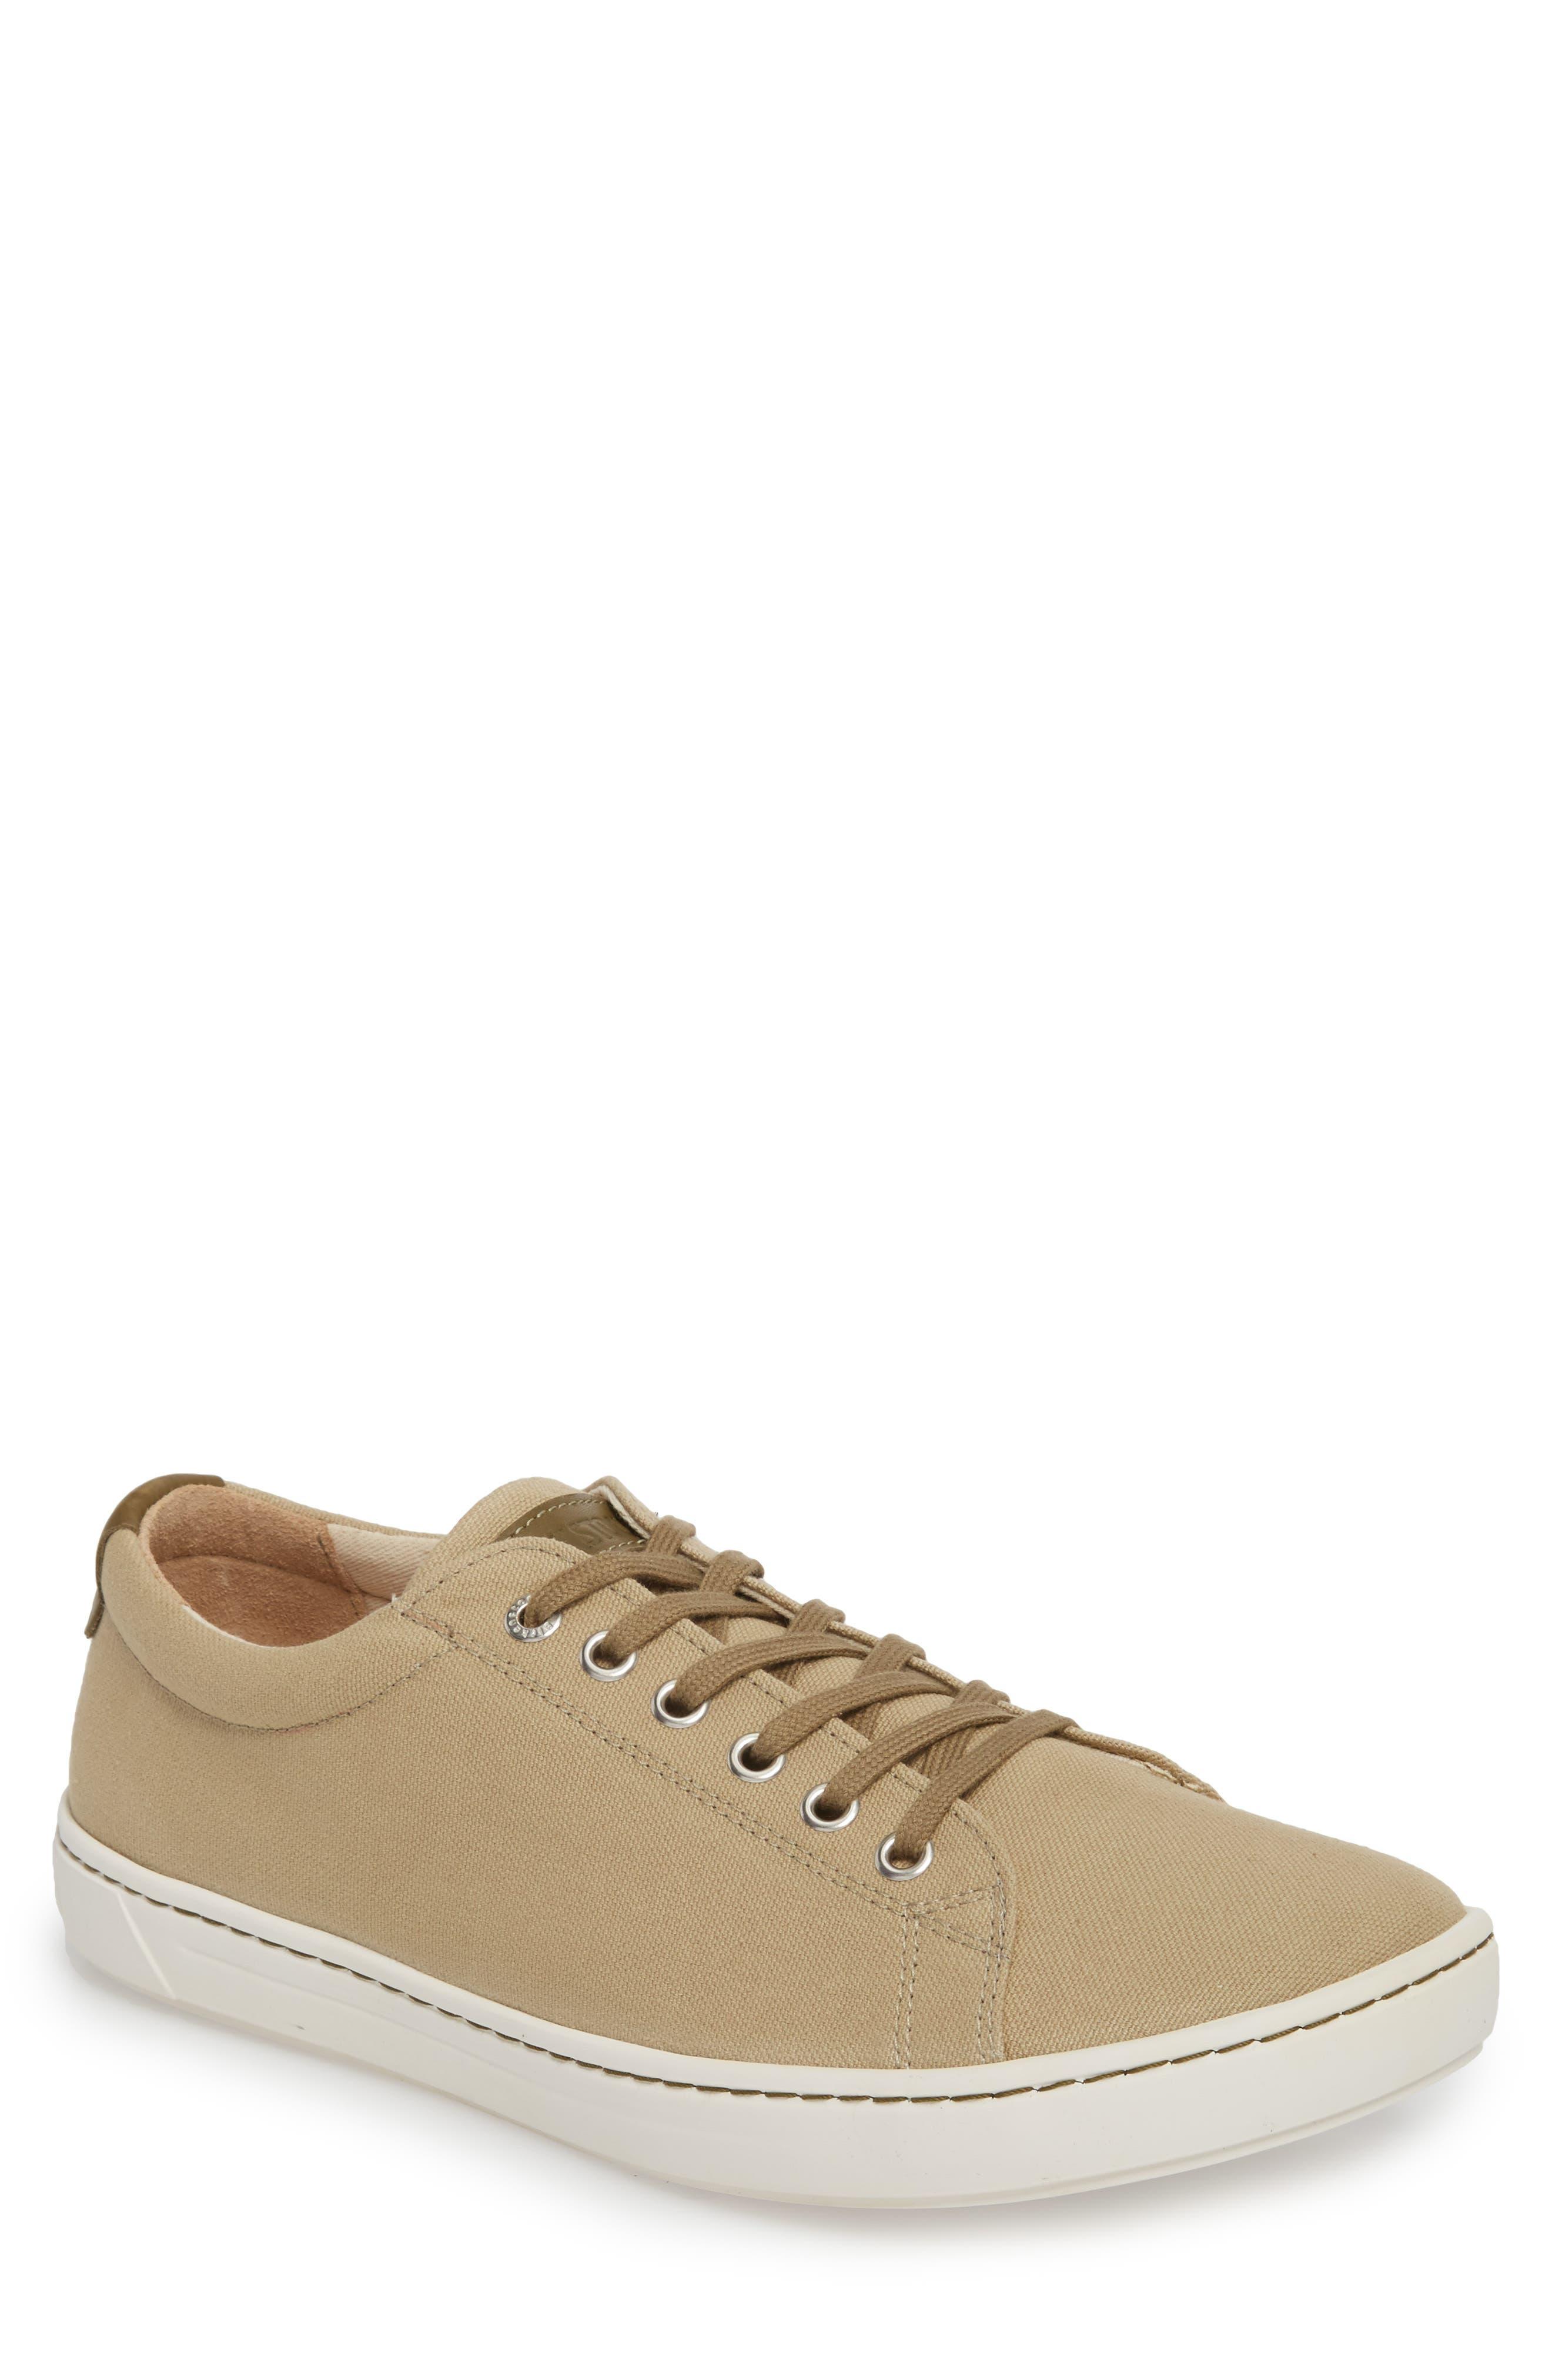 Arran Sneaker,                             Main thumbnail 1, color,                             Khaki Canvas